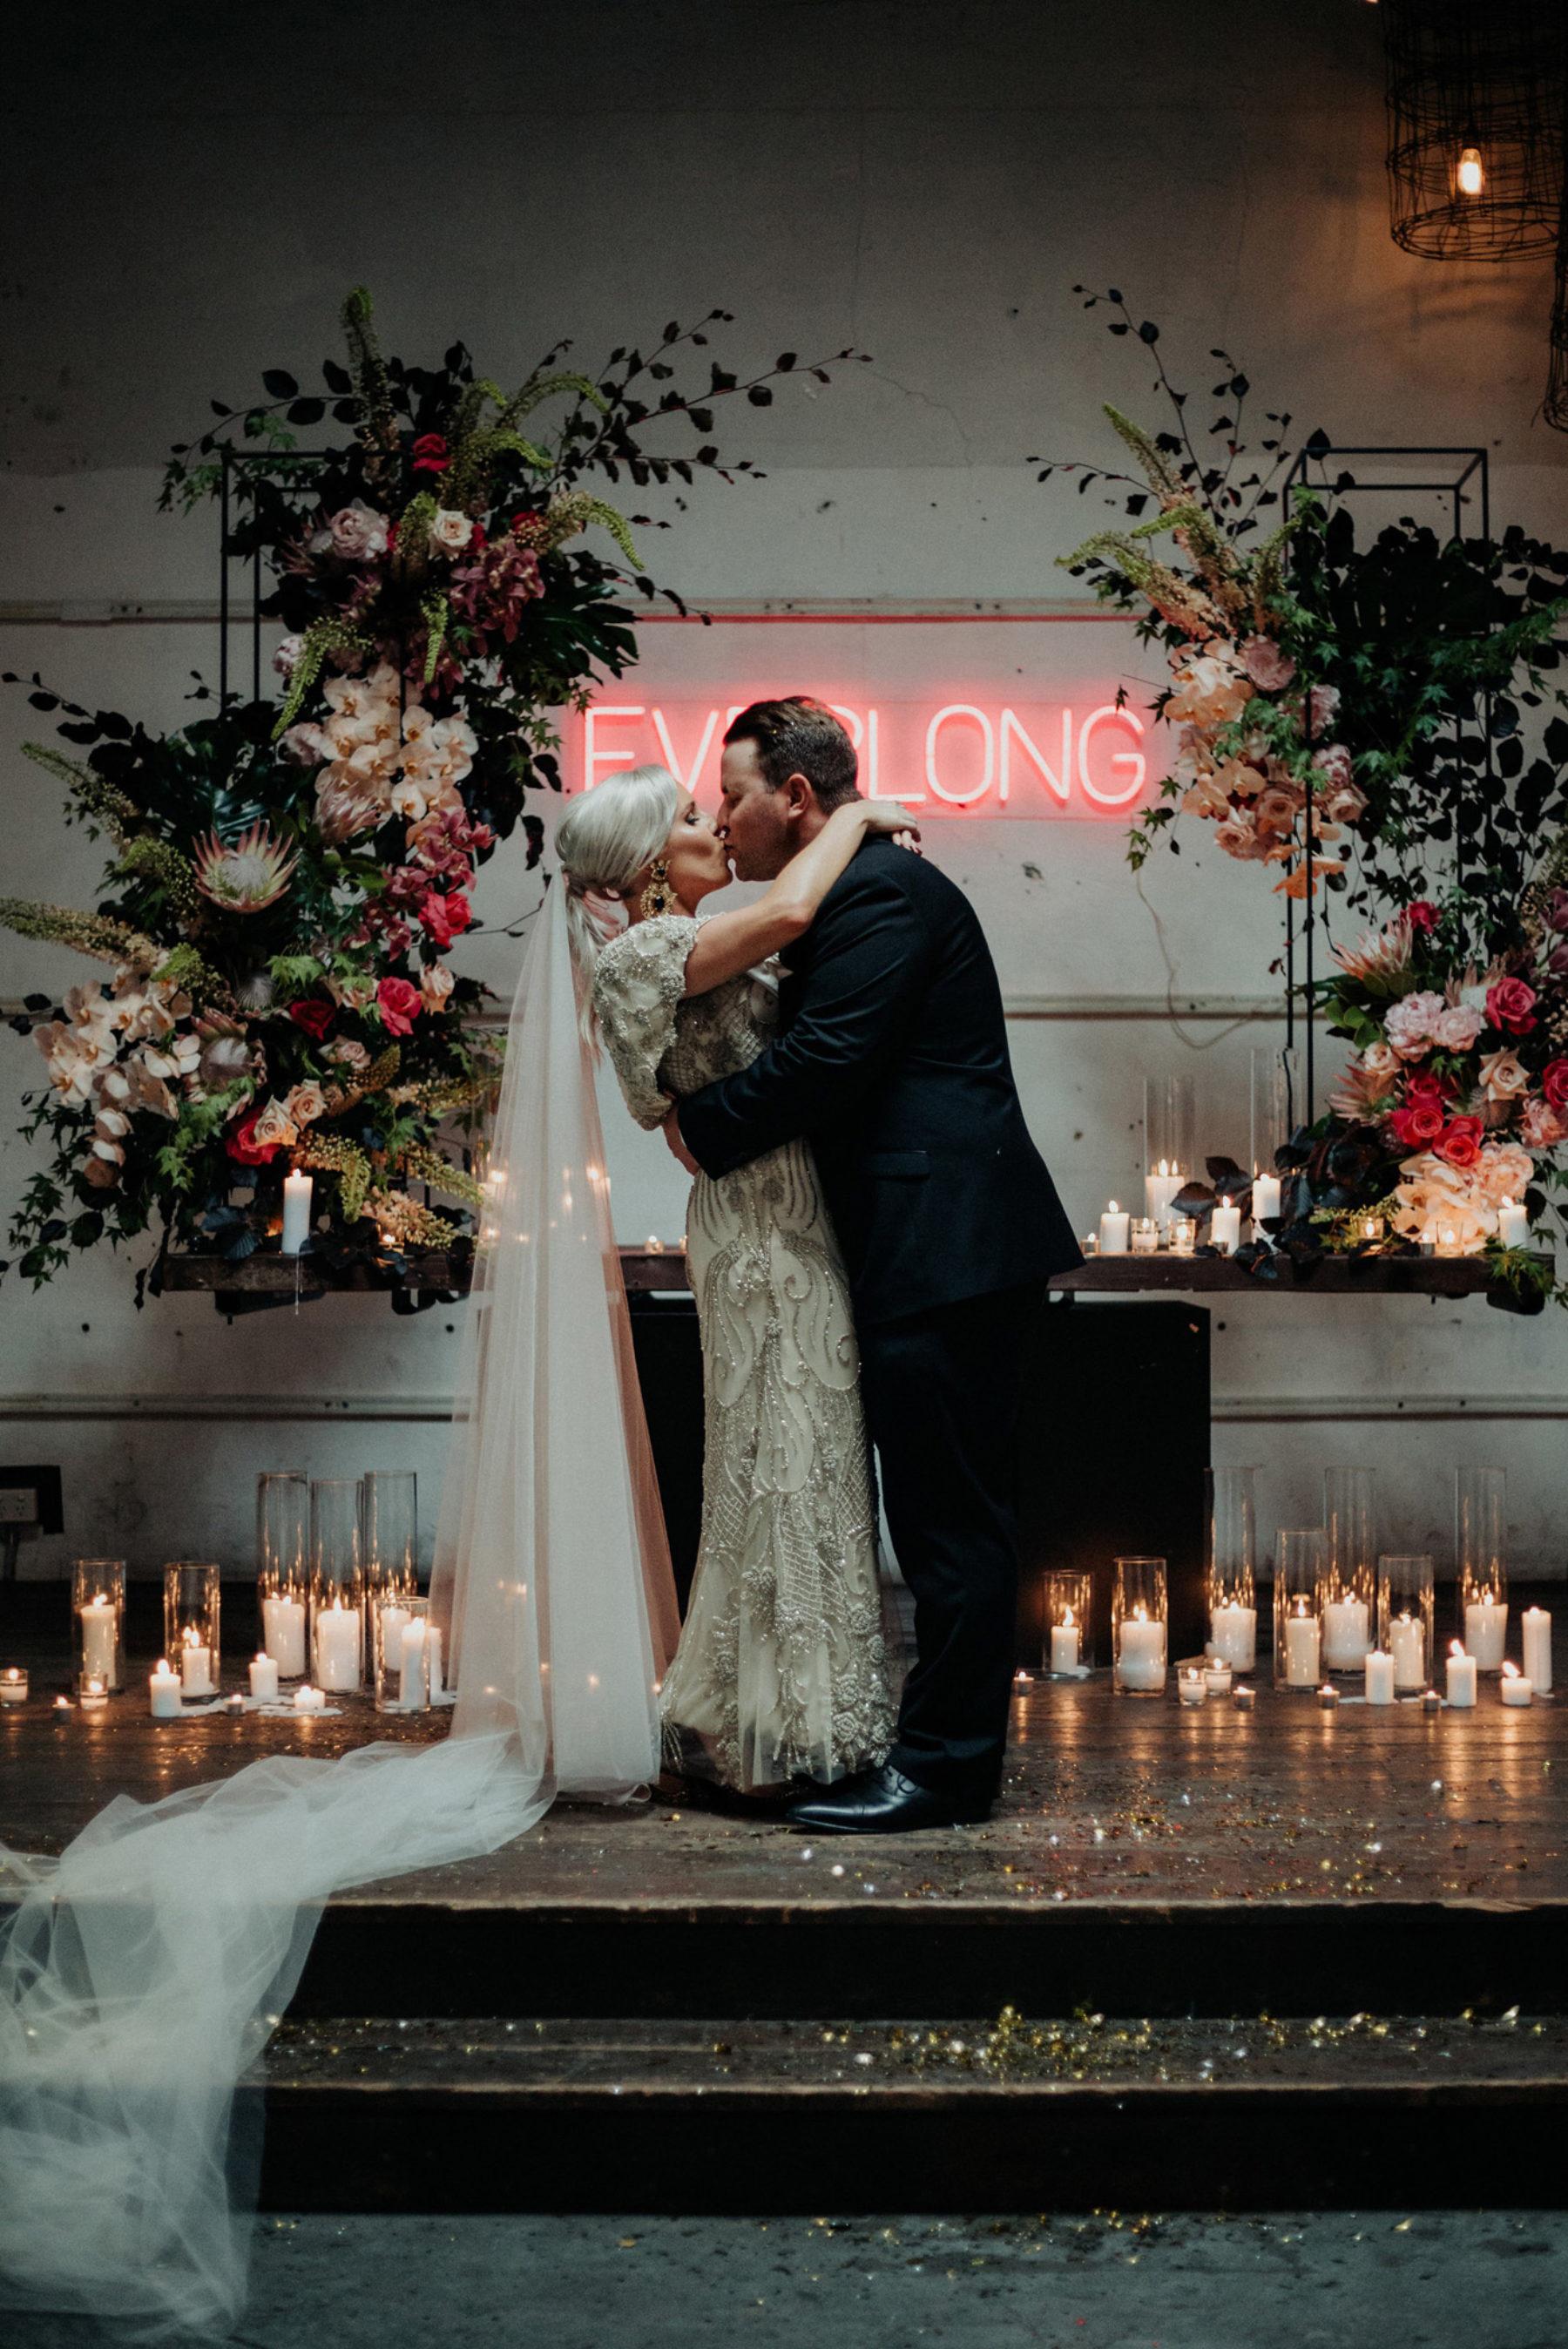 bang-bang-boogaloo-wedding-melbourne-14-1800x0-c-default.jpg